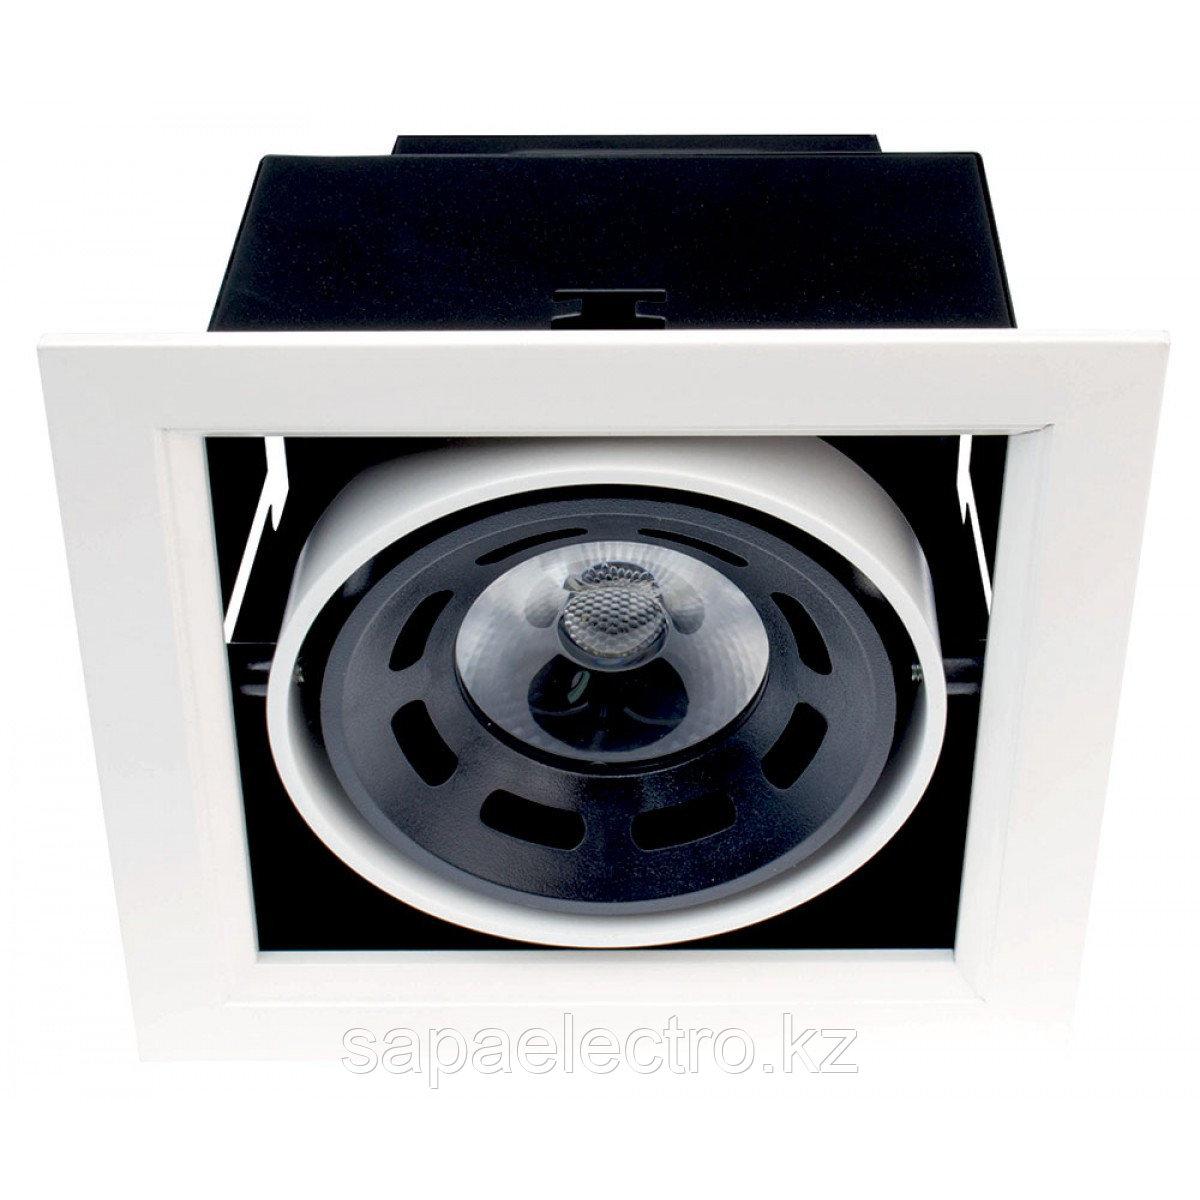 Свет-к DOWNLIGHT LED DD119 8W BLACK 5000K (TS)27